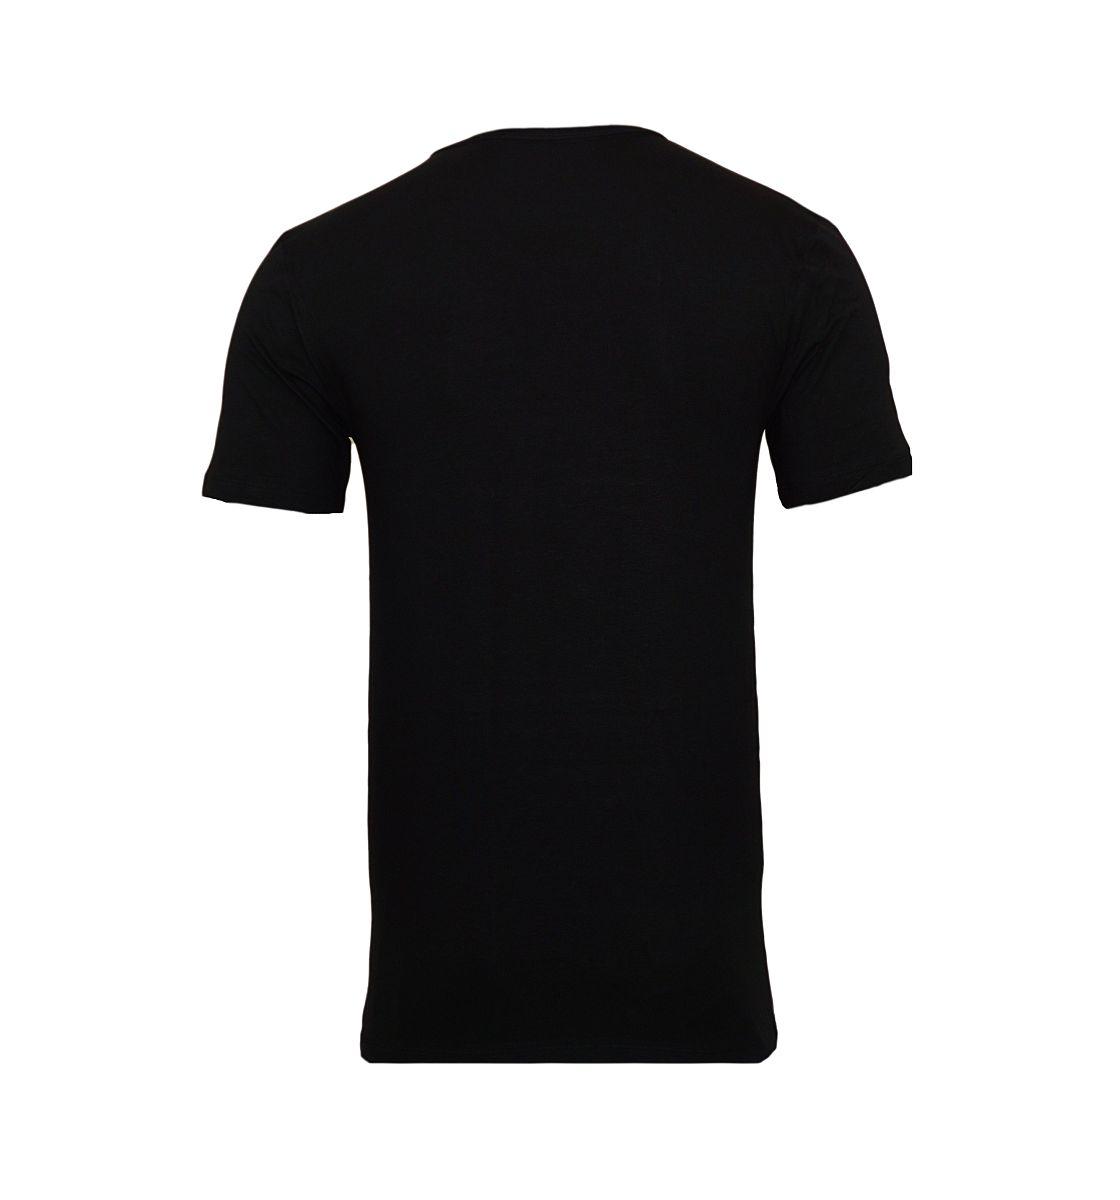 Baldessarini 2er Pack T-Shirts Kurzarm 90004 6061 9009 jet black W18-BST1